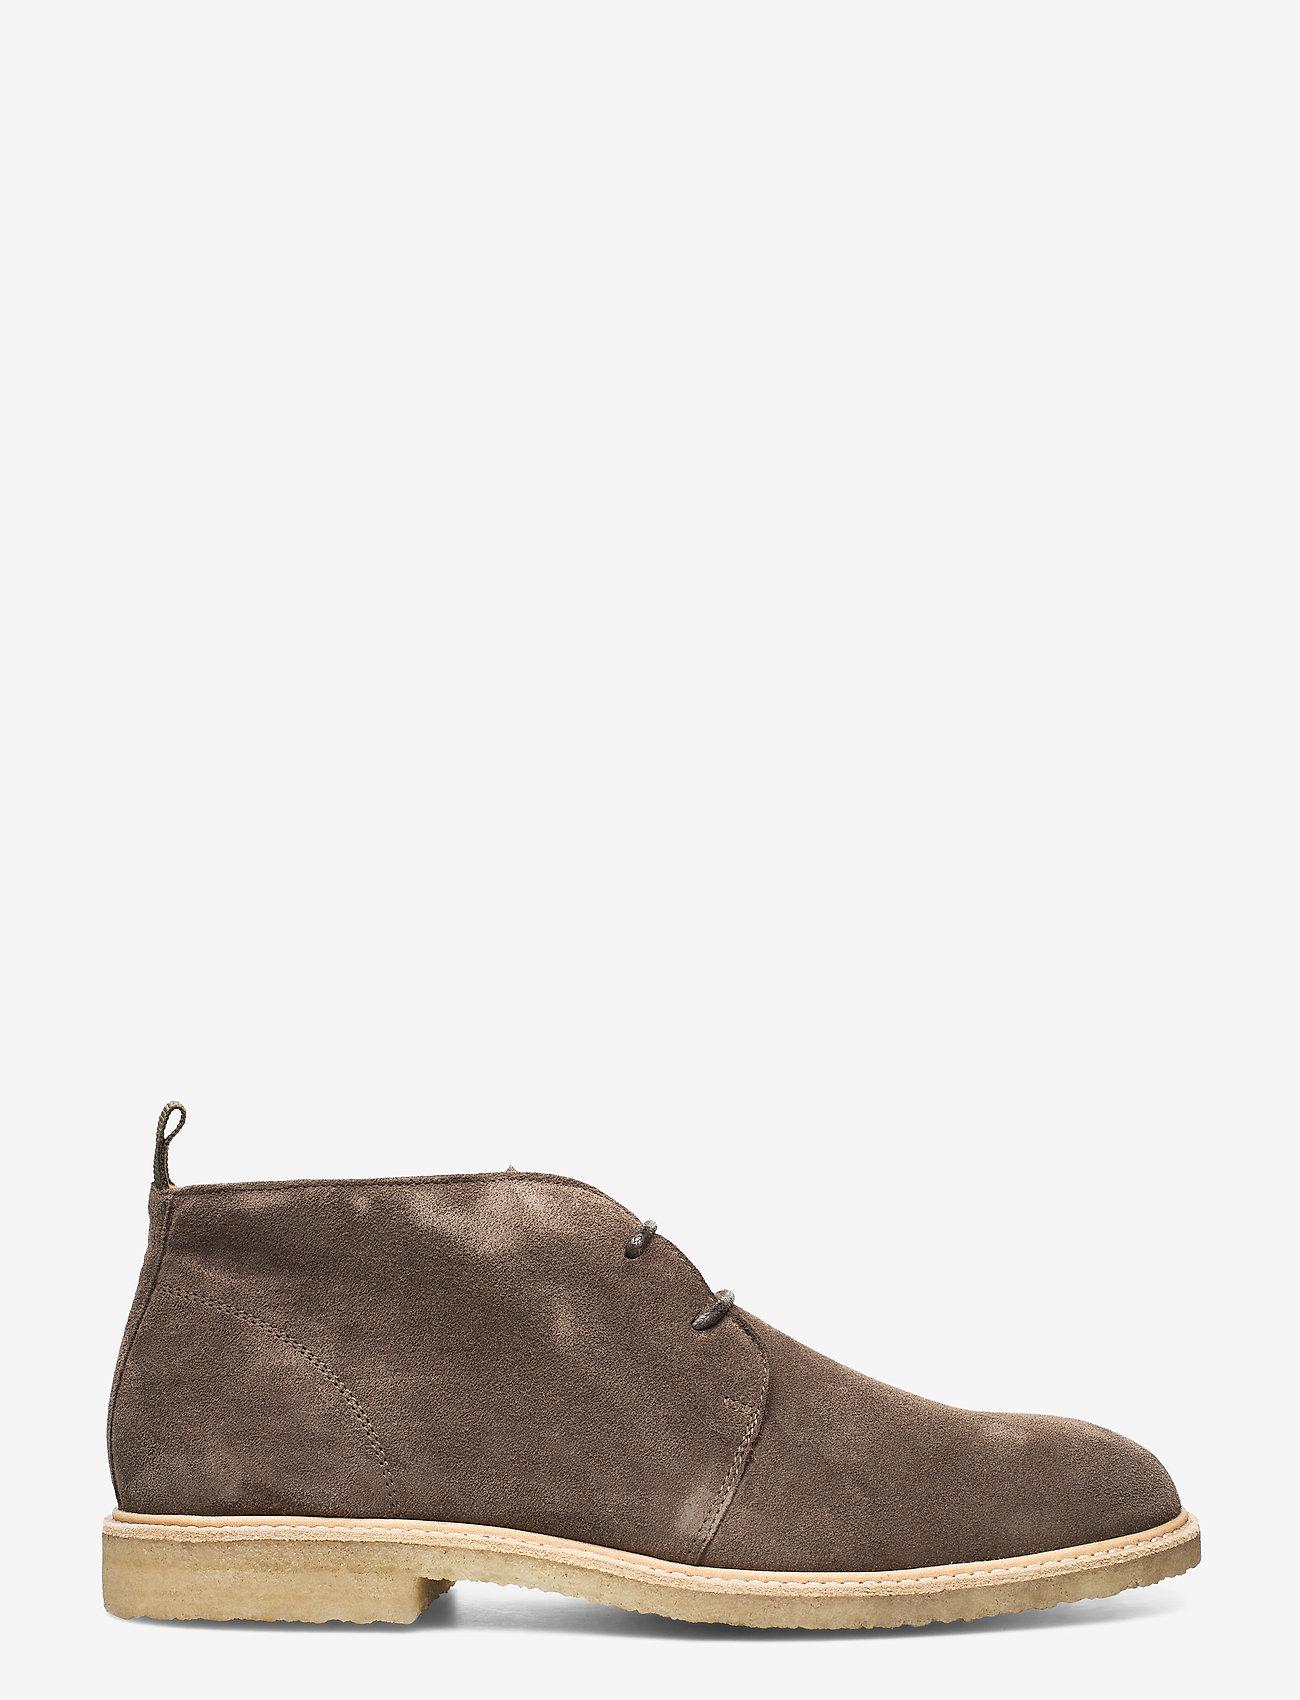 Playboy Footwear - ORG.64 - desert boots - taupe - 1